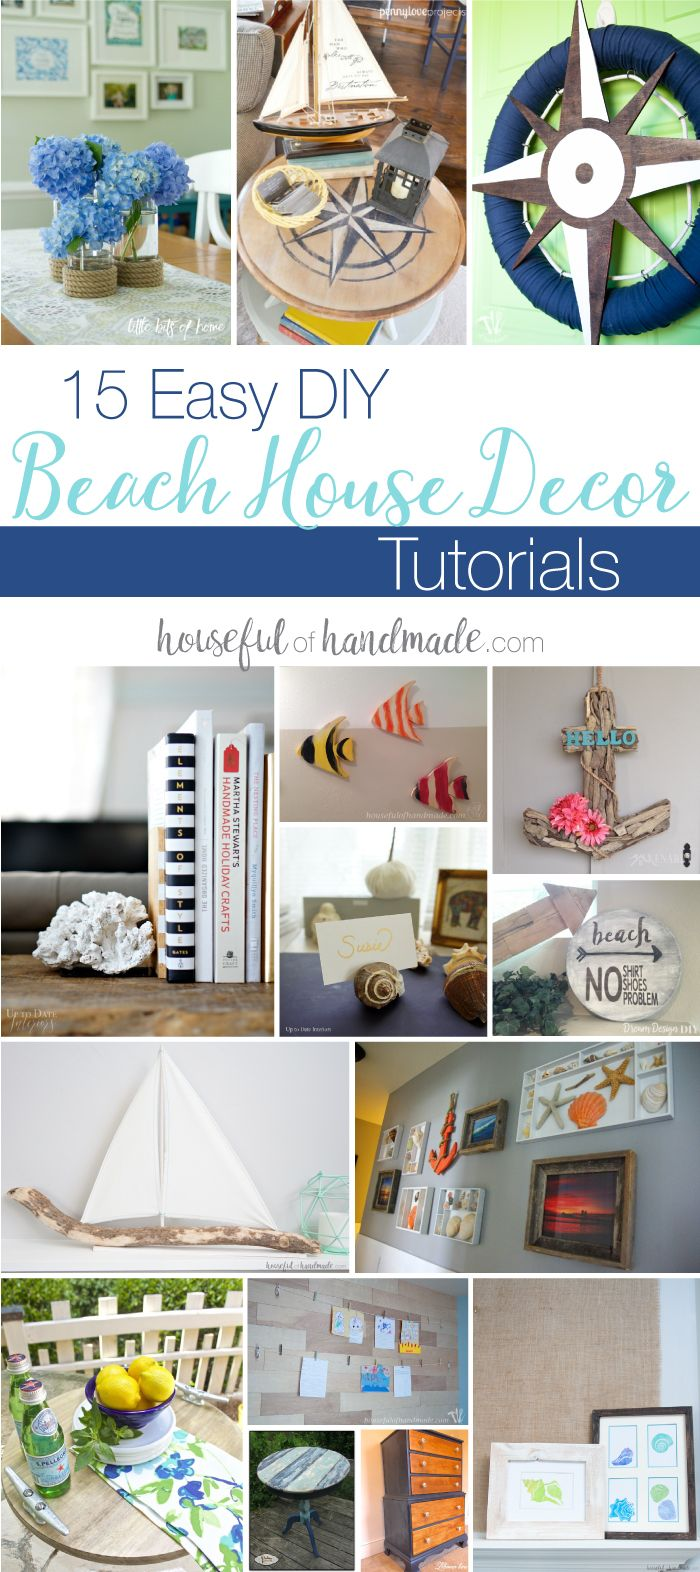 Photo of 15 Easy DIY Beach House Decor Tutorials